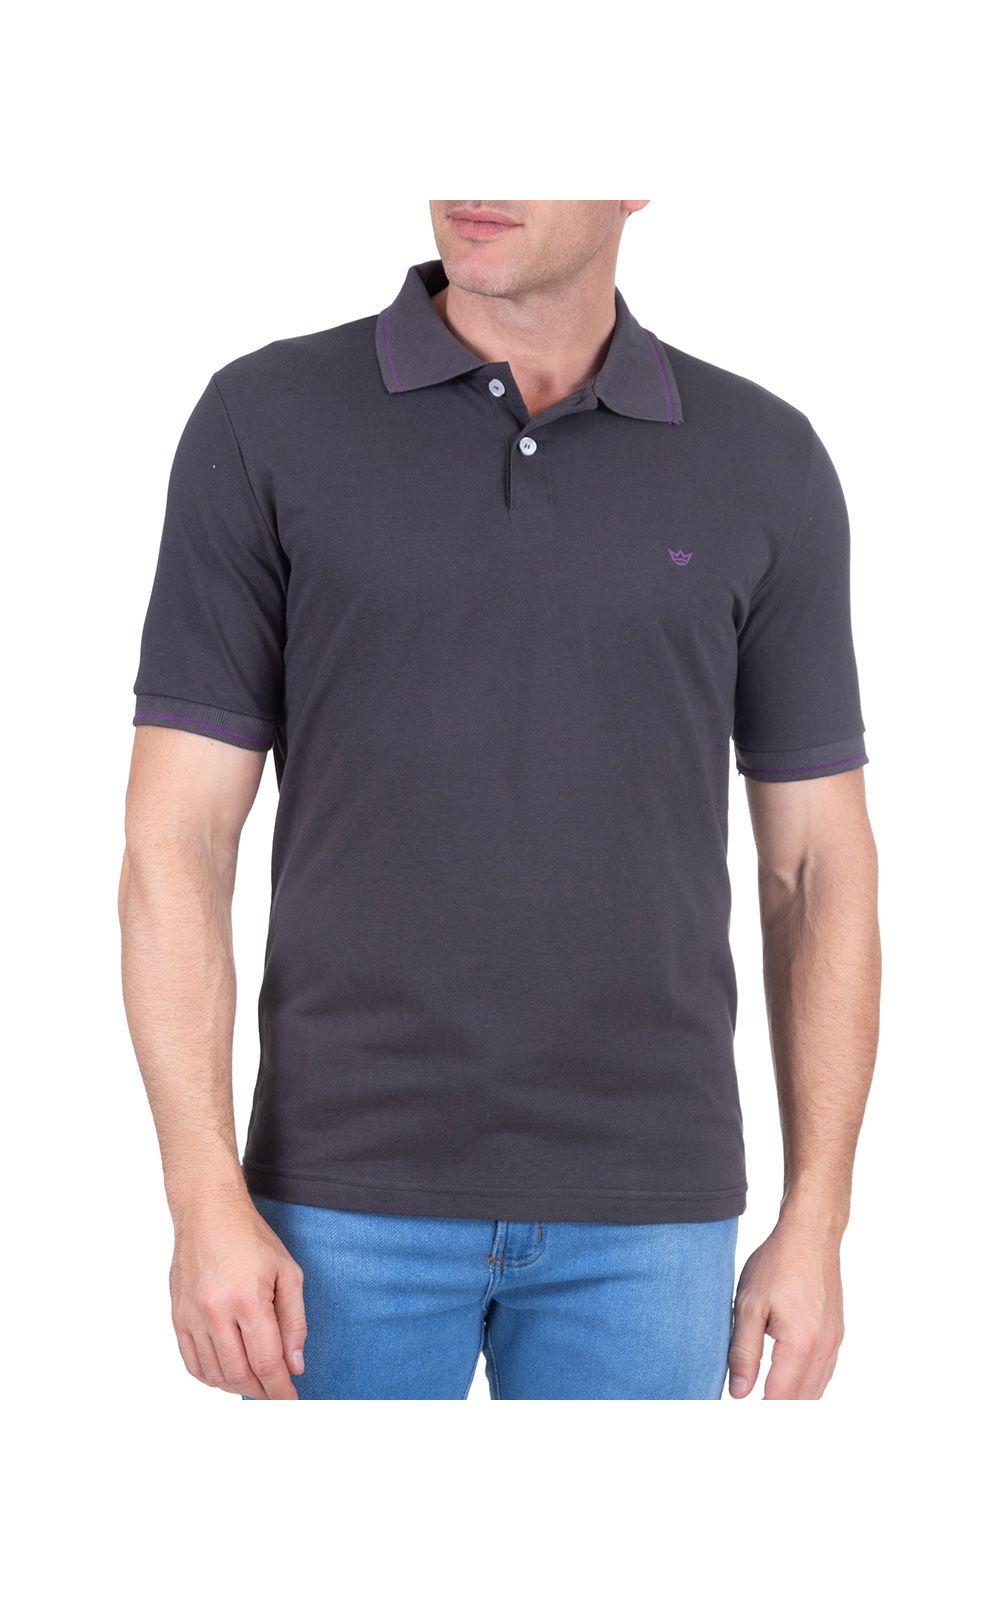 Foto 1 - Camisa Polo Masculina Cinza Escuro Lisa